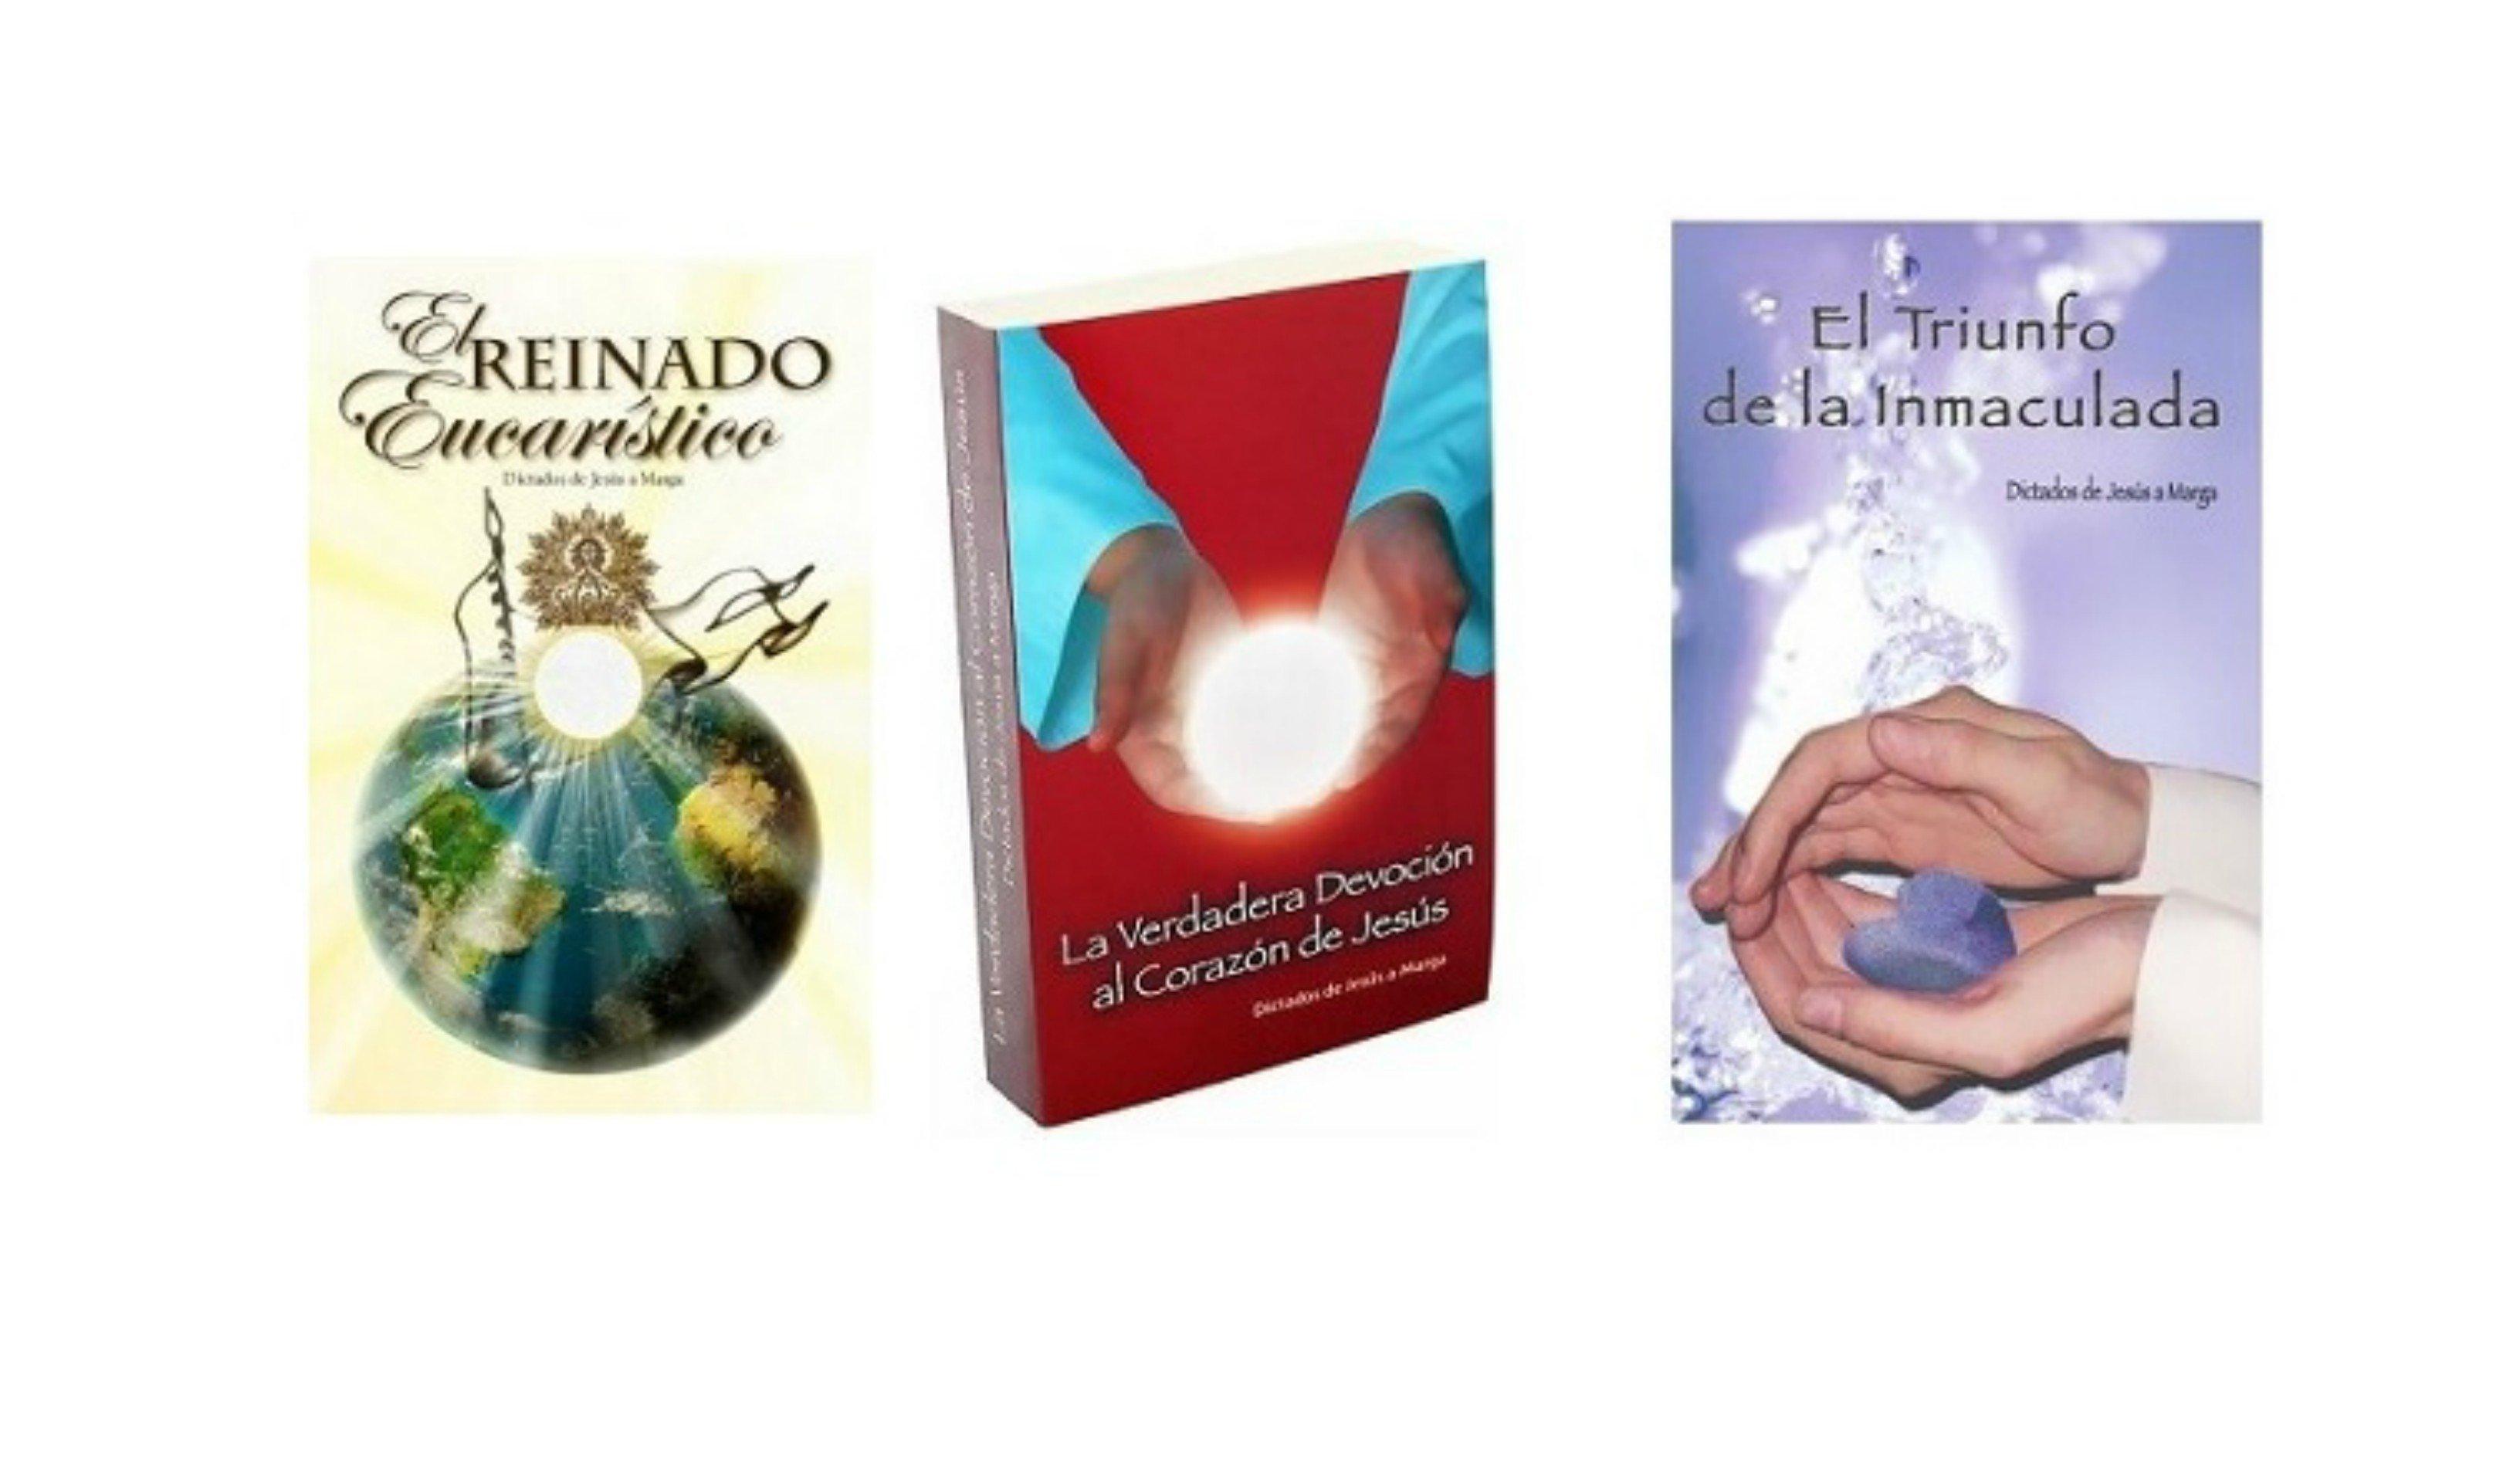 Temas proféticos destacados